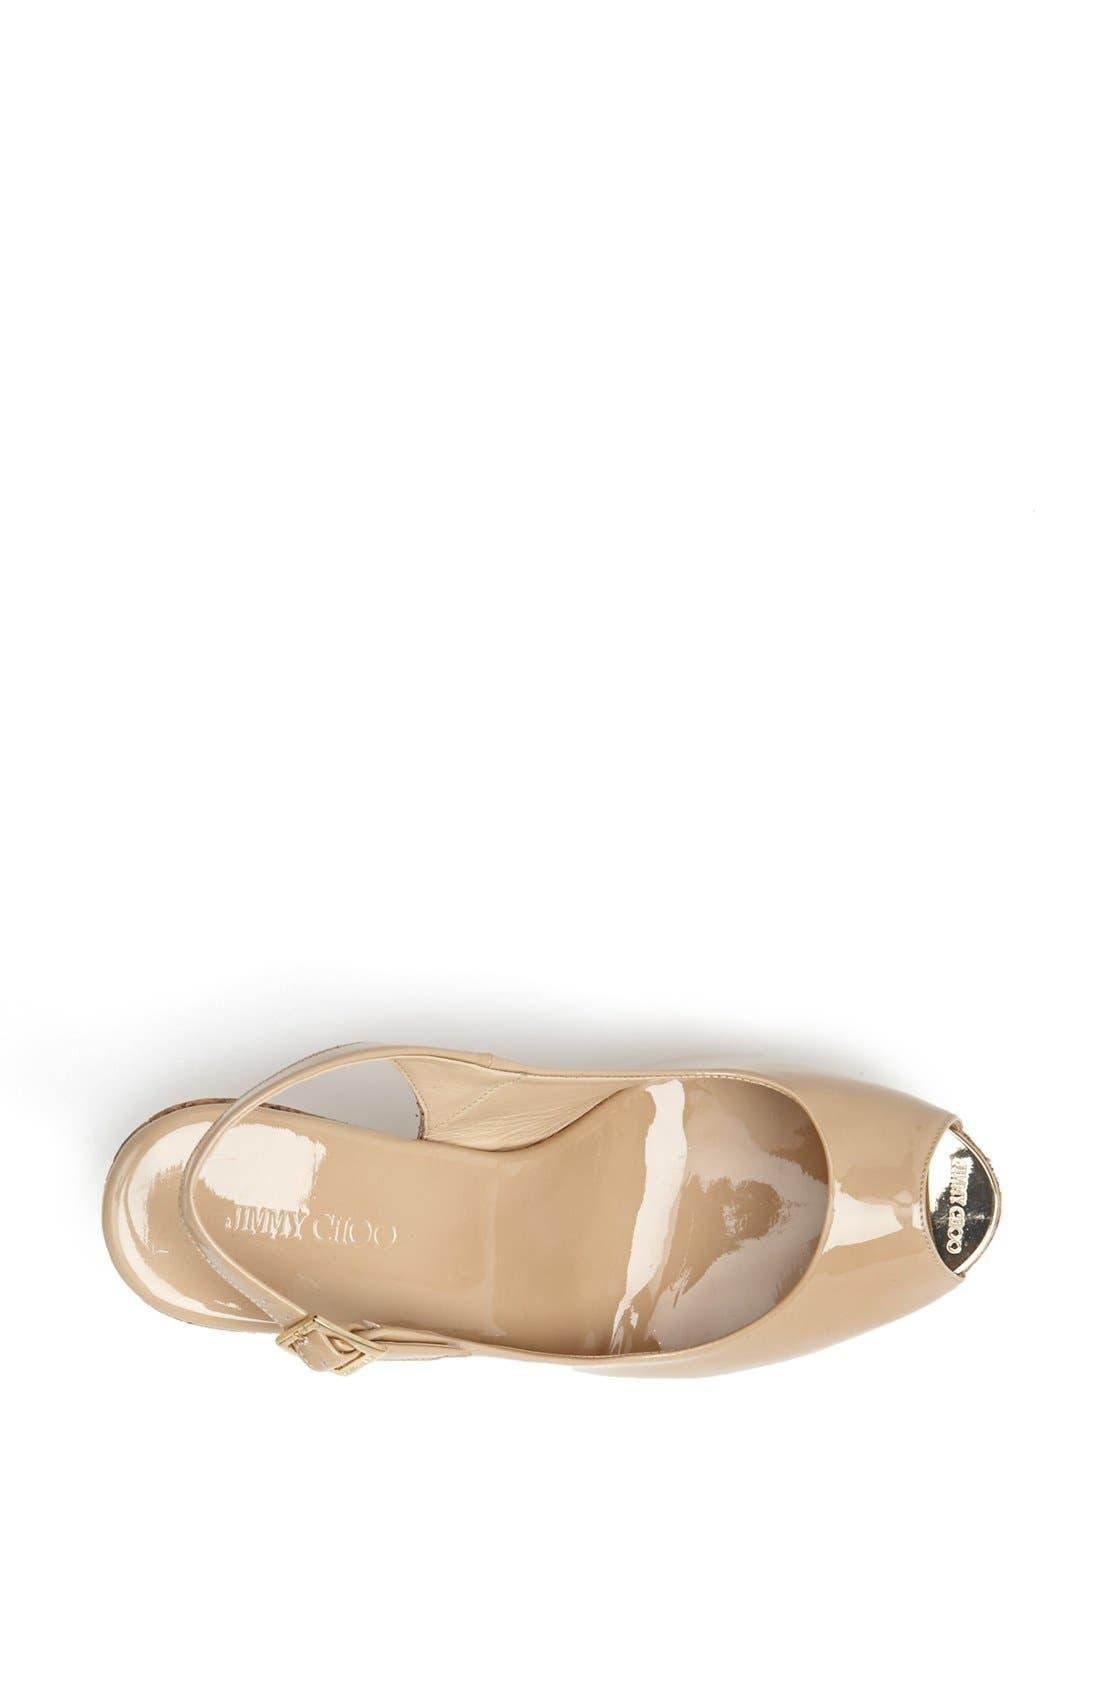 'Prova' Cork Slingback Wedge Sandal,                             Alternate thumbnail 5, color,                             270